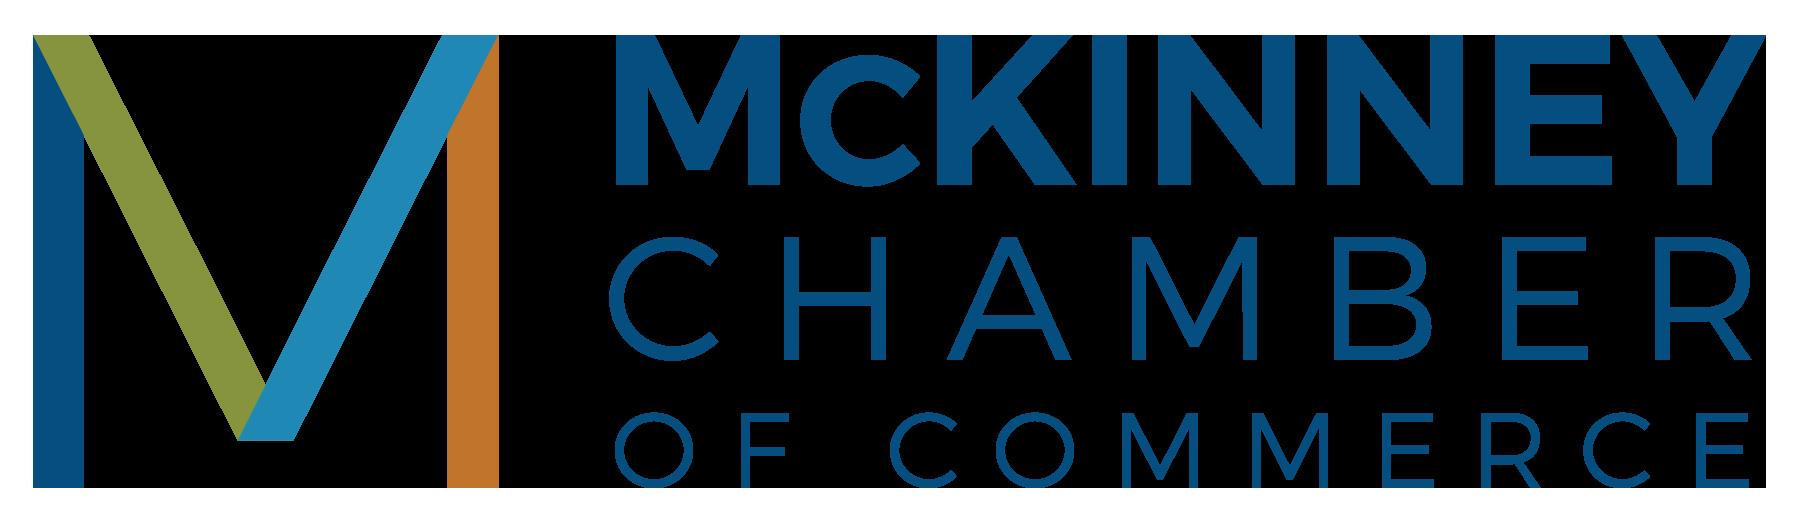 Chamber-logo-hz